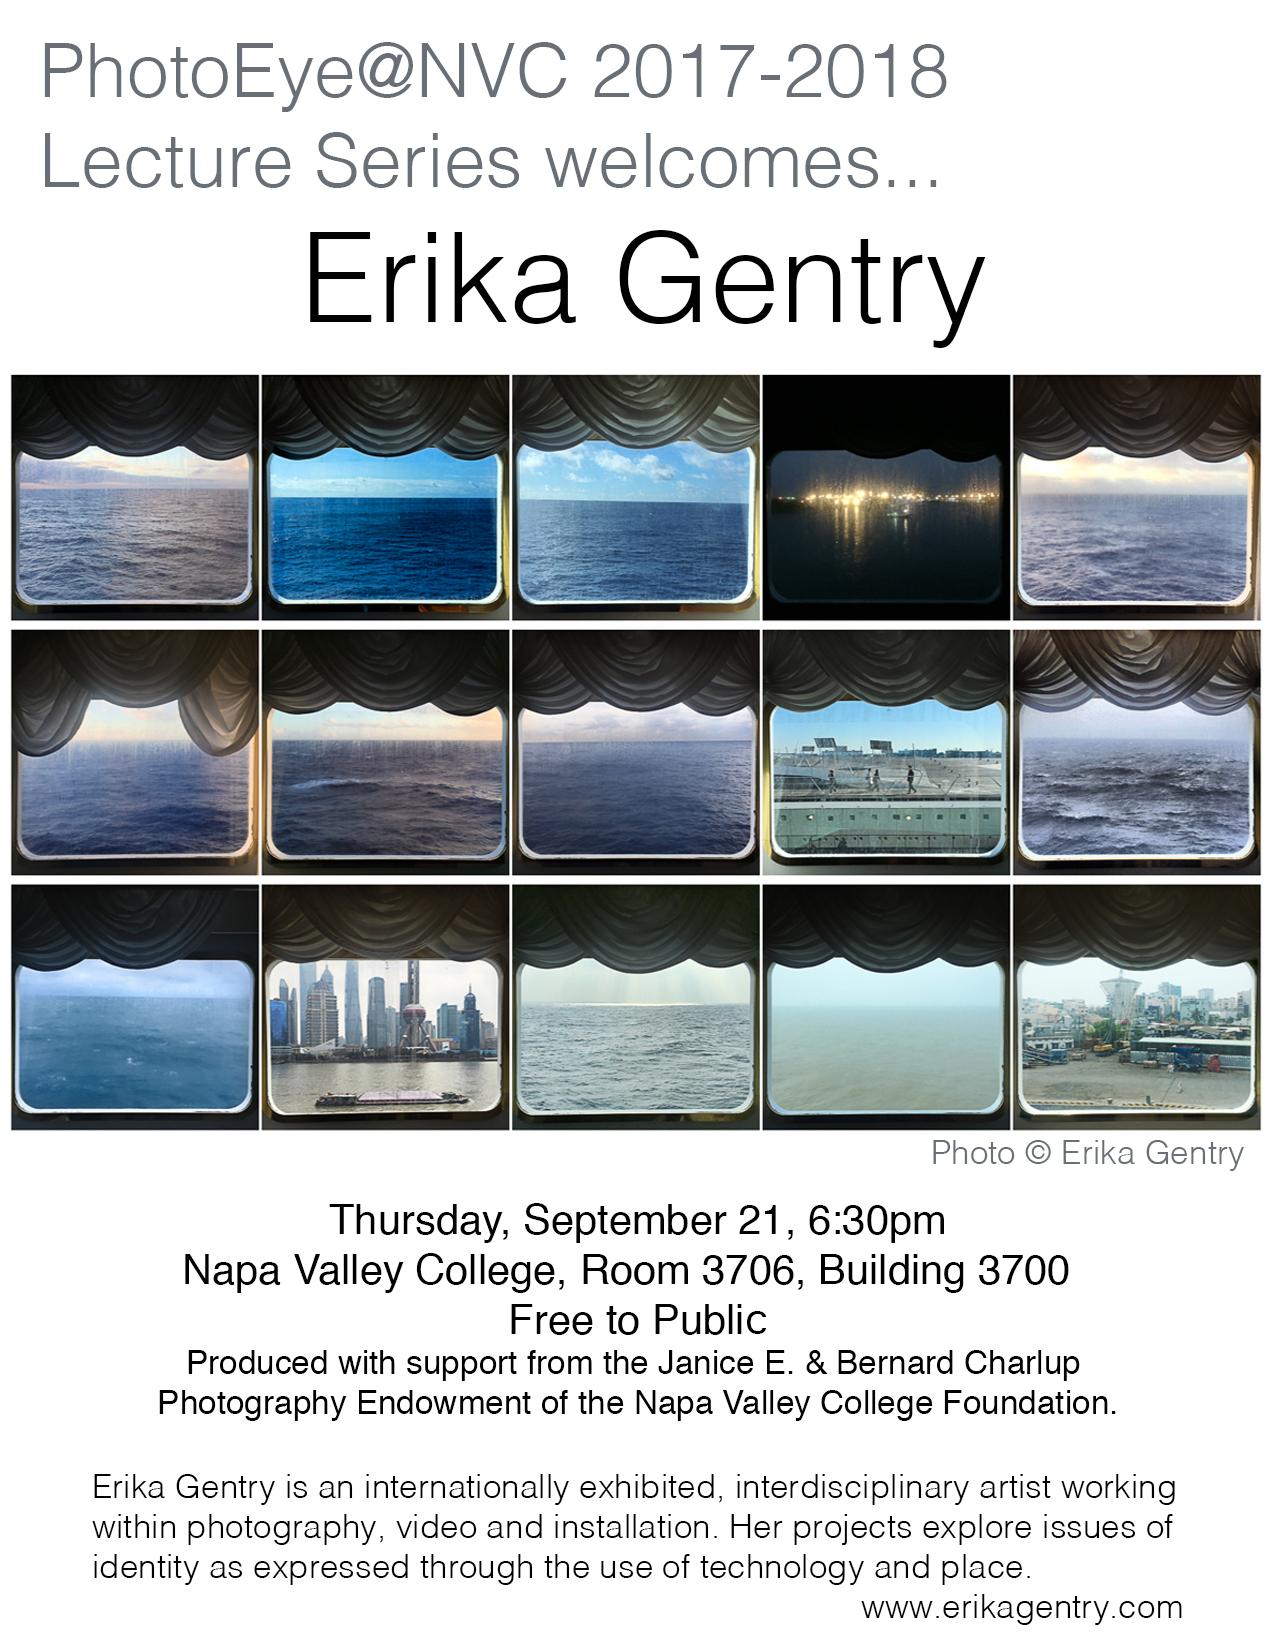 ErikaGentrypostcard.jpg